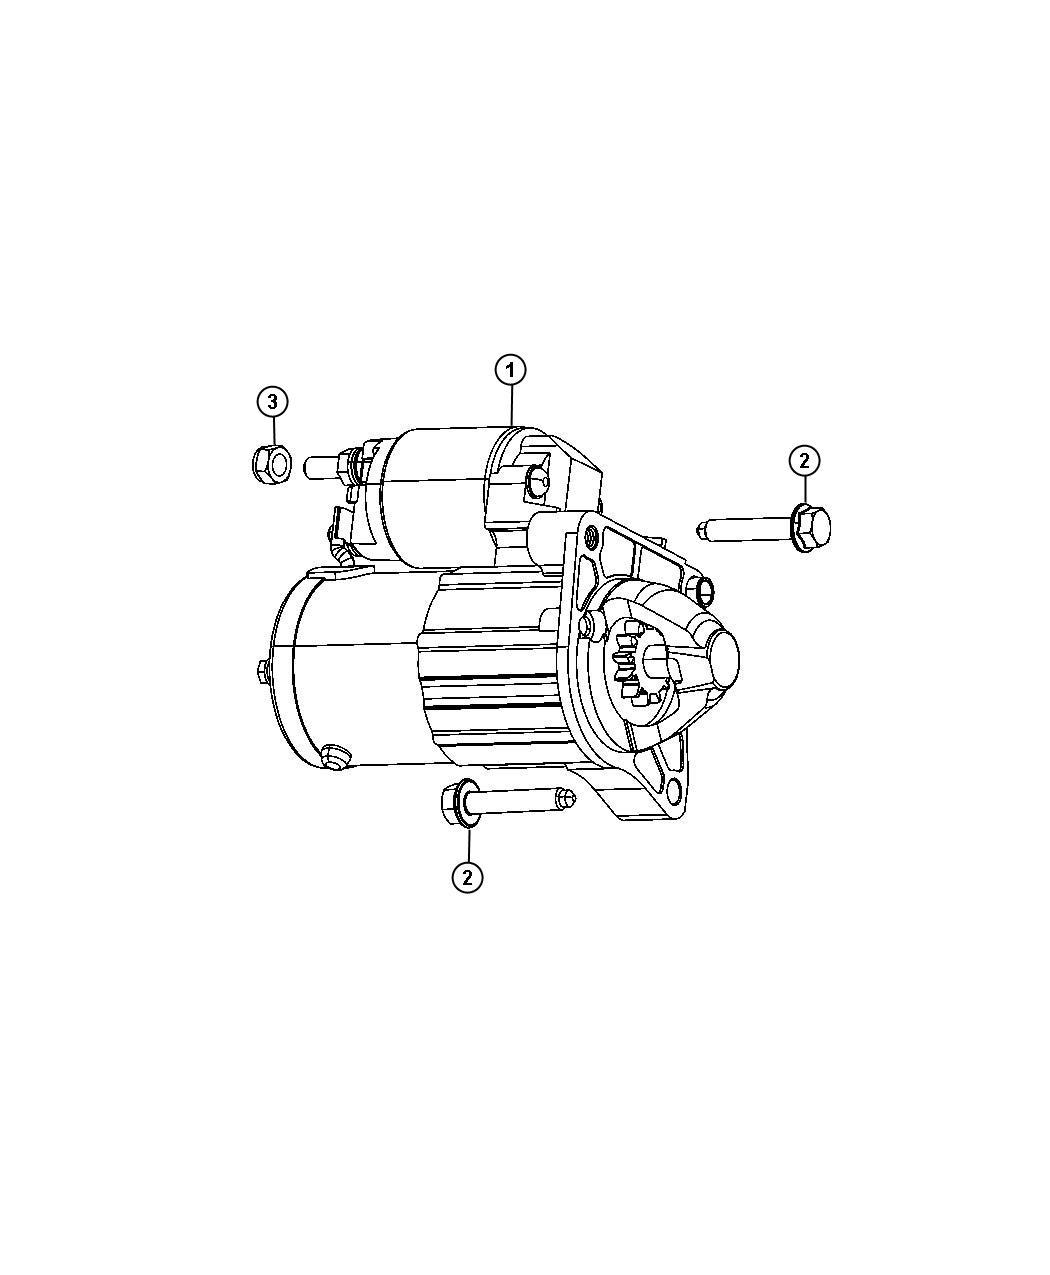 Dodge Dart Nut. Hex. M8x1.25. Alternator jumper, battery